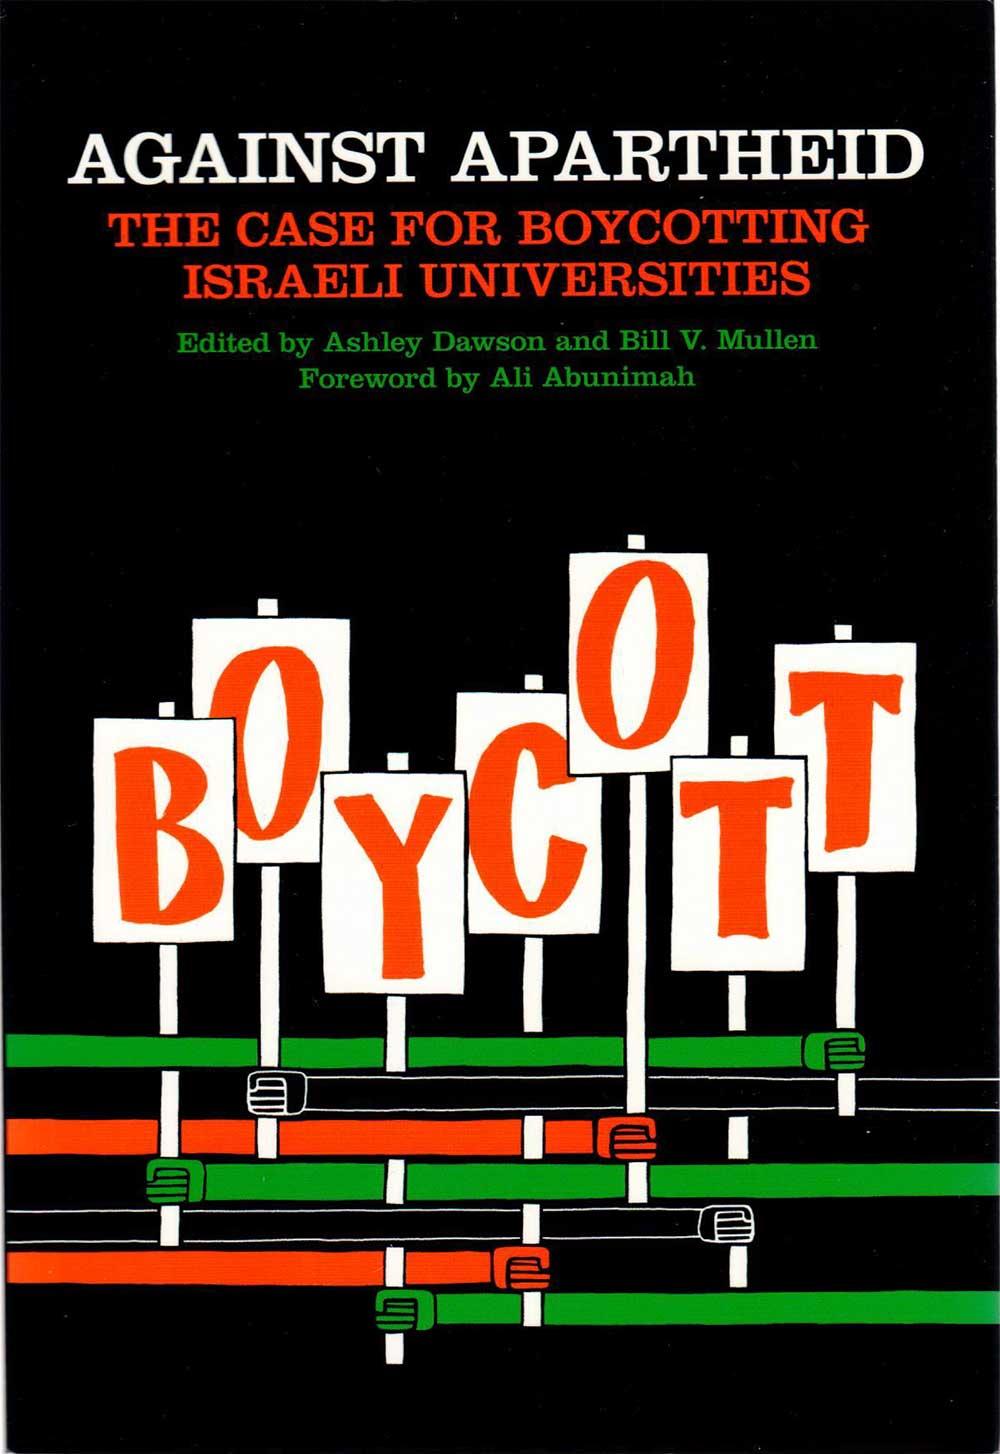 mullen-book-cover8-against-apartheid-1000px.jpg